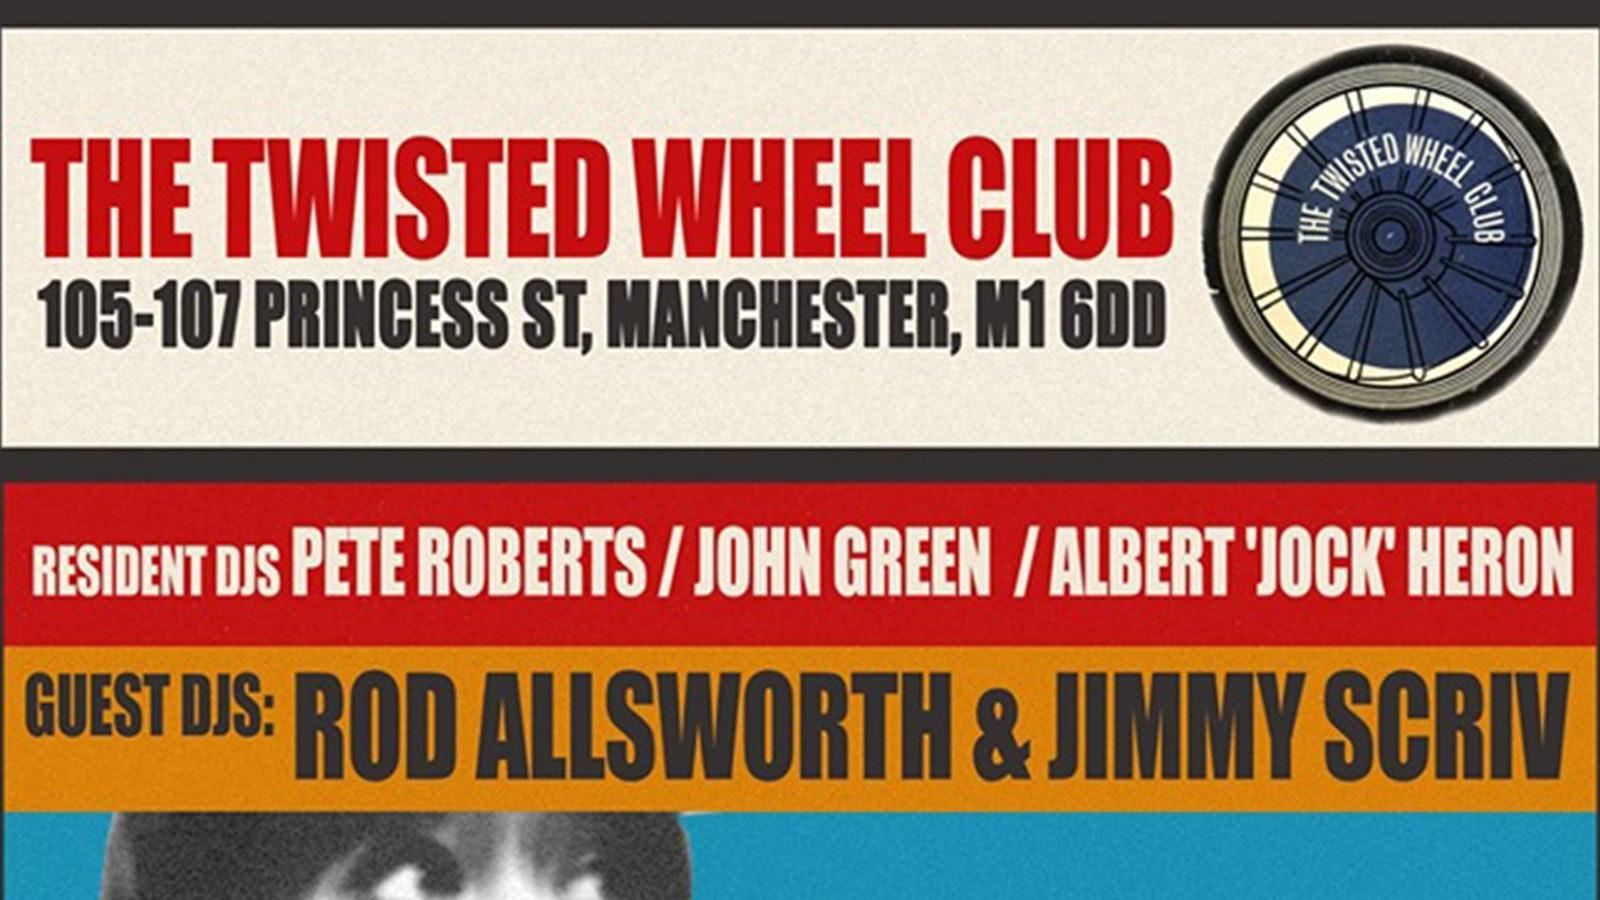 The Twisted Wheel Club